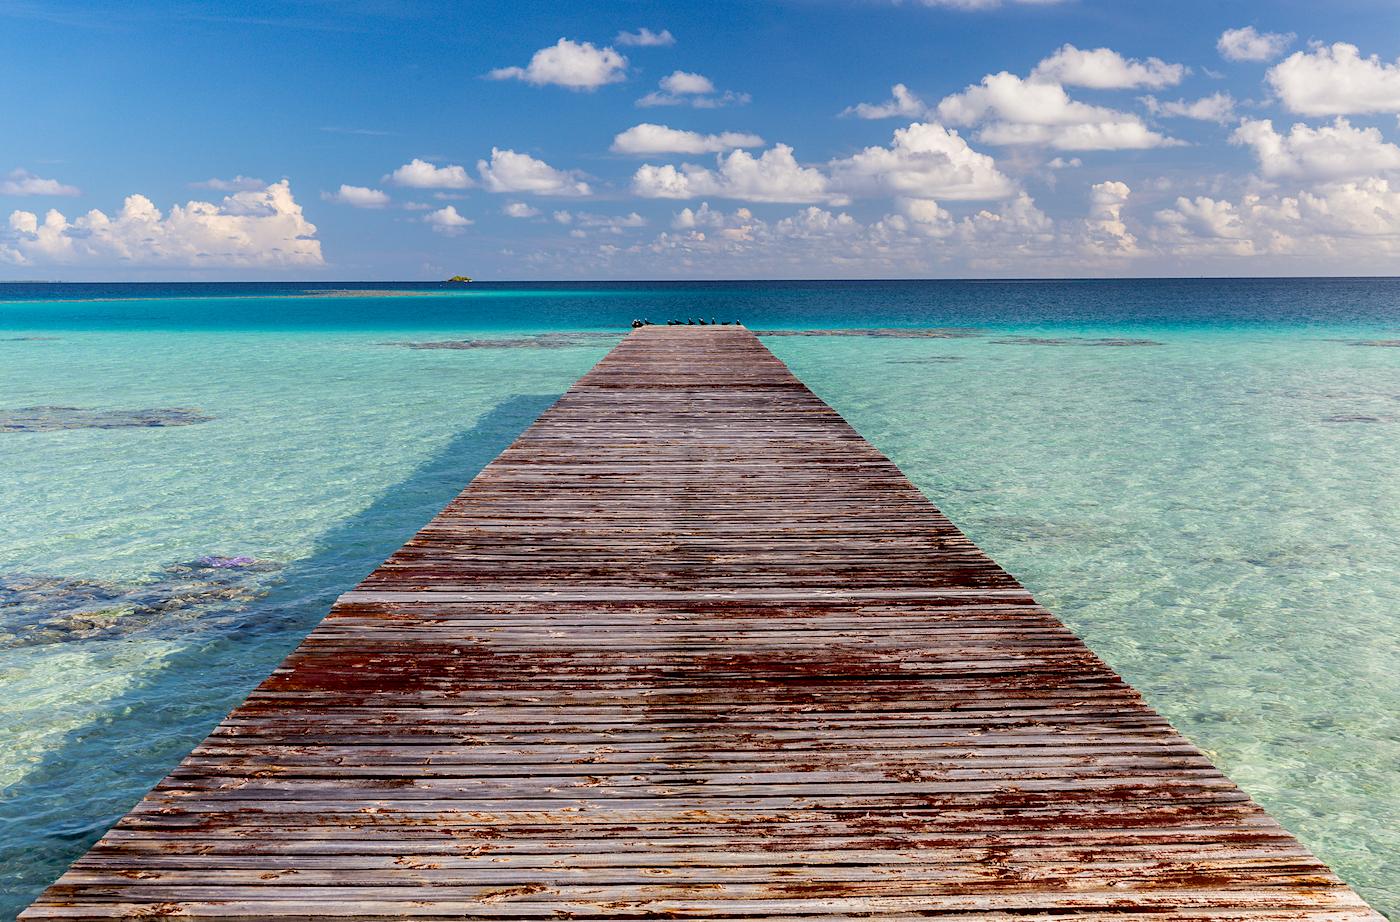 Voyage en Polynésie Française - Sylvain Pons